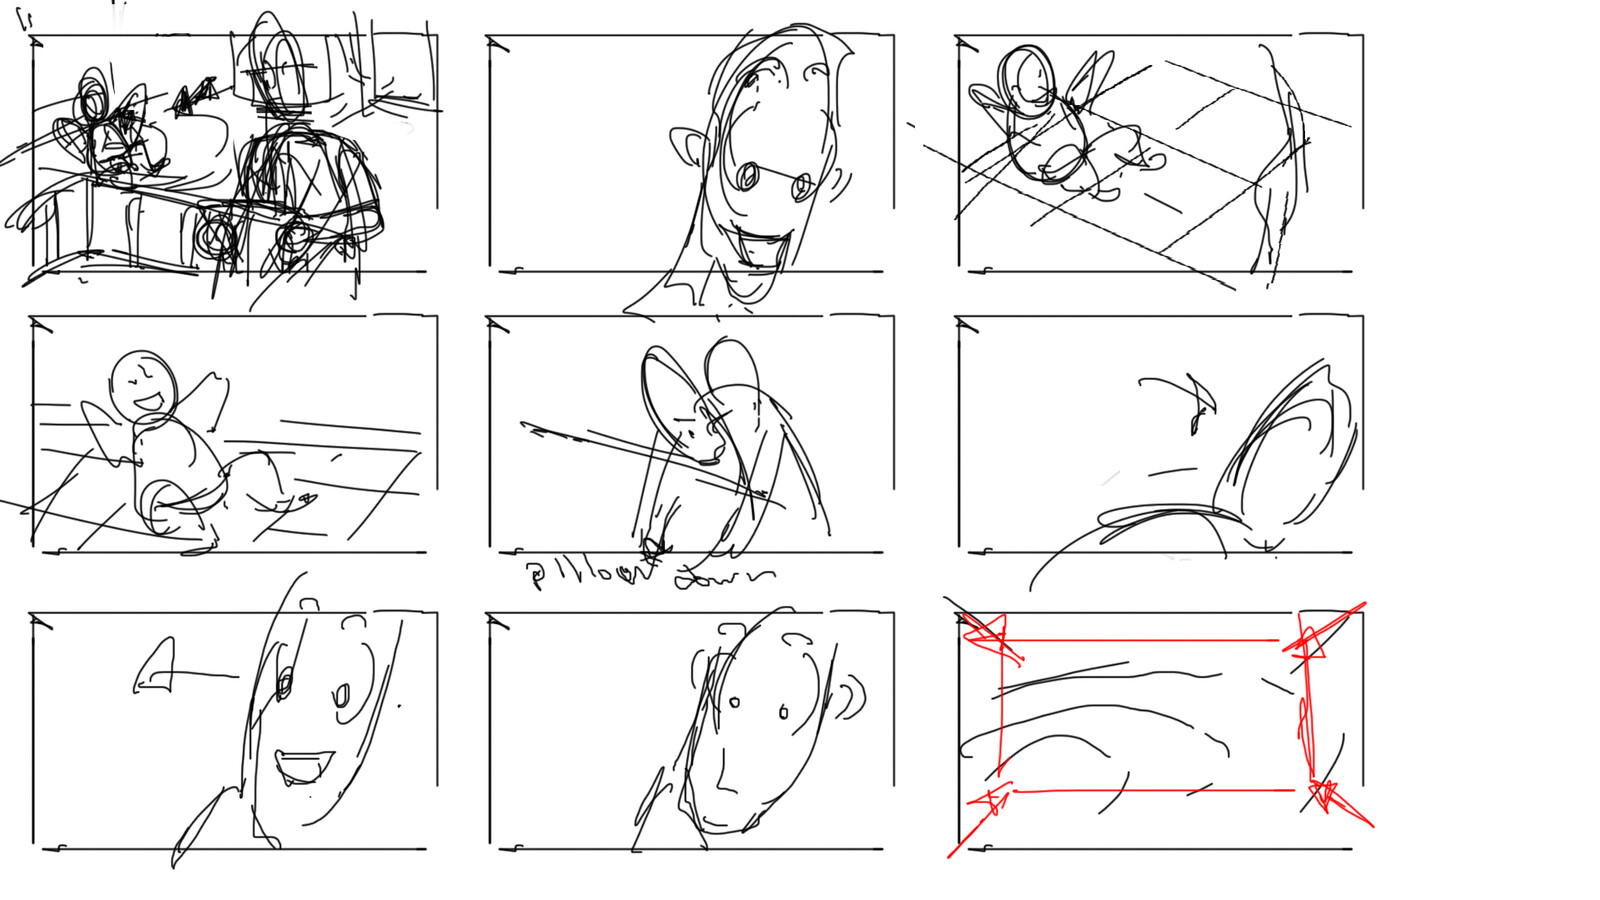 Quick thumbnail sketches